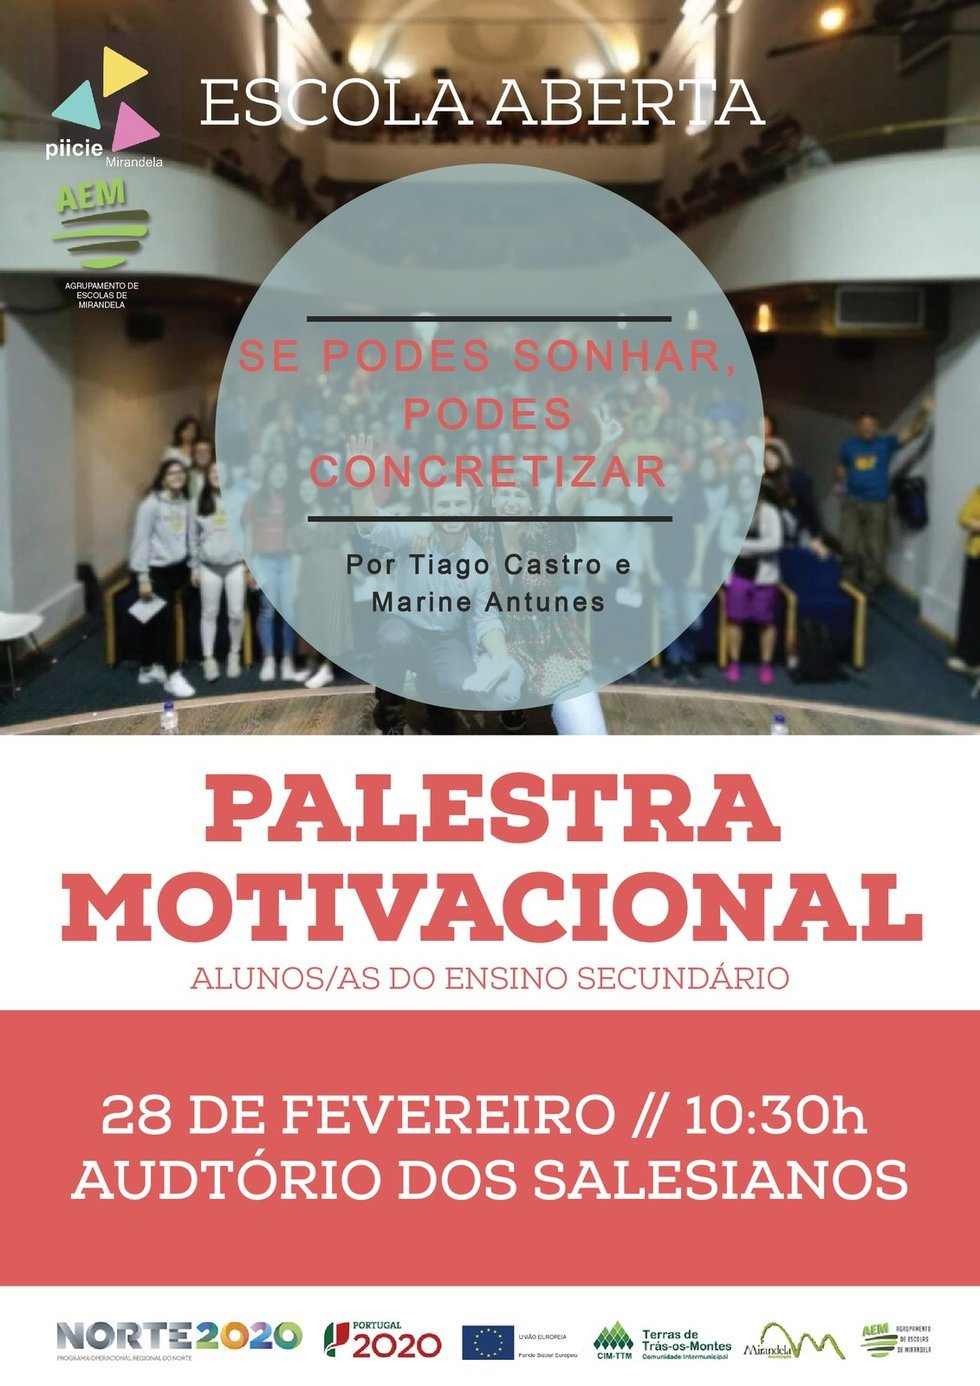 Palestra Motivacional - PIICIE